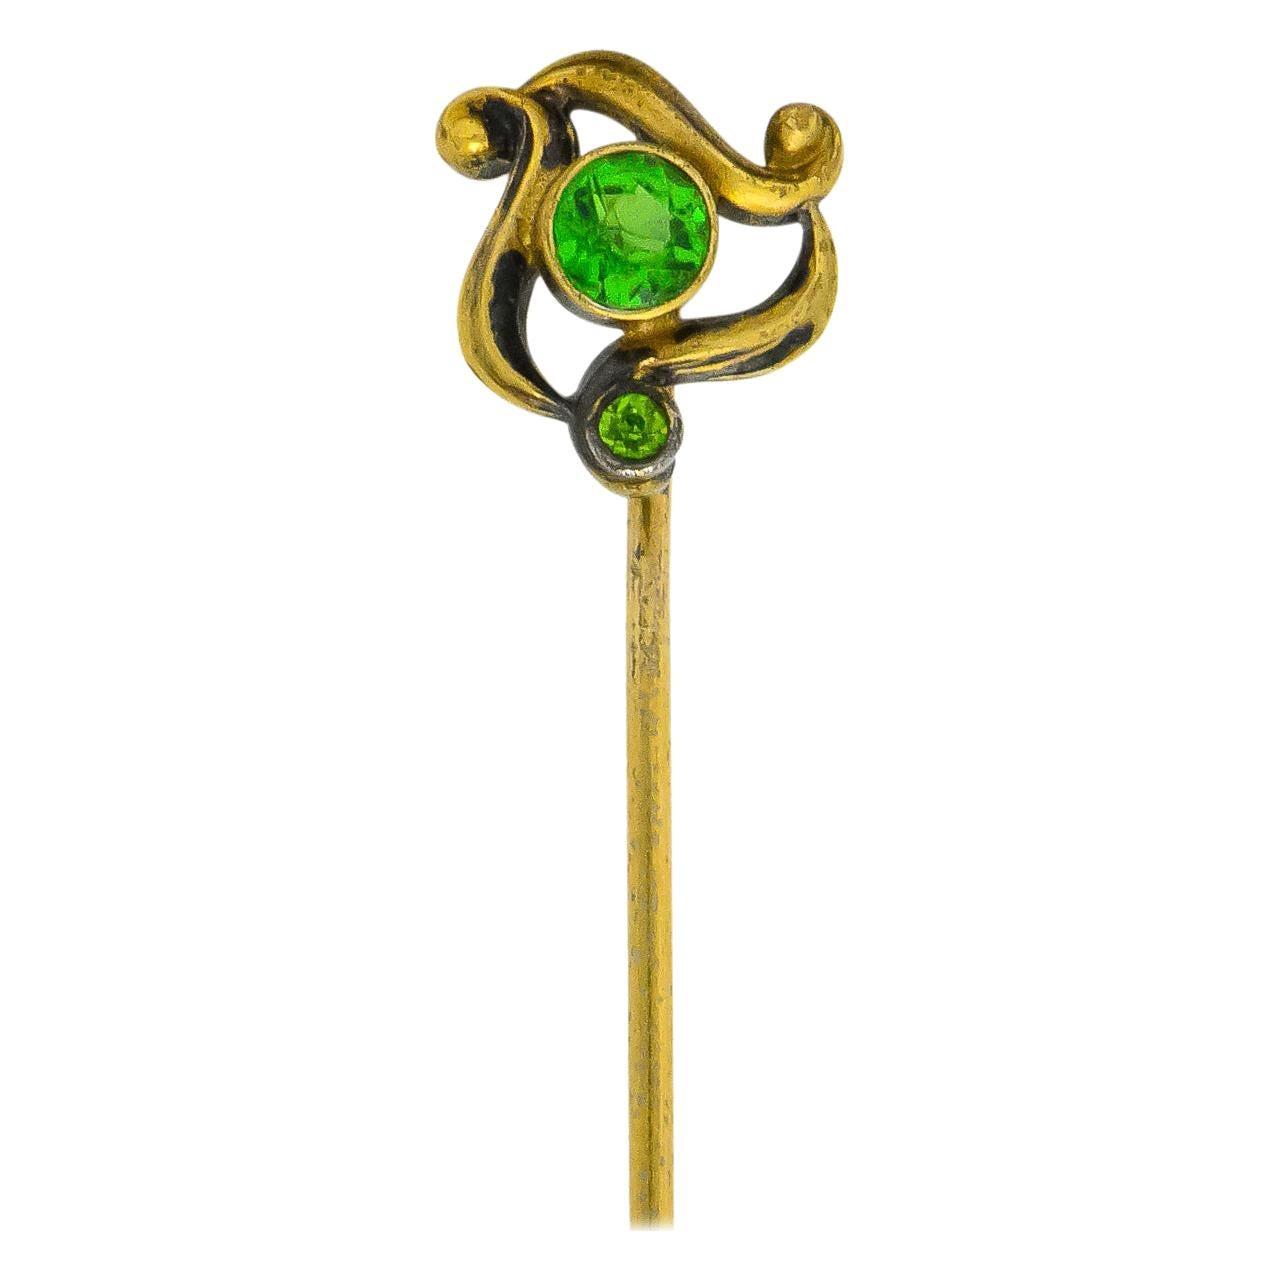 Art Nouveau 0.40 Carat Demantoid Garnet Gold Stylized Whiplash Stickpin